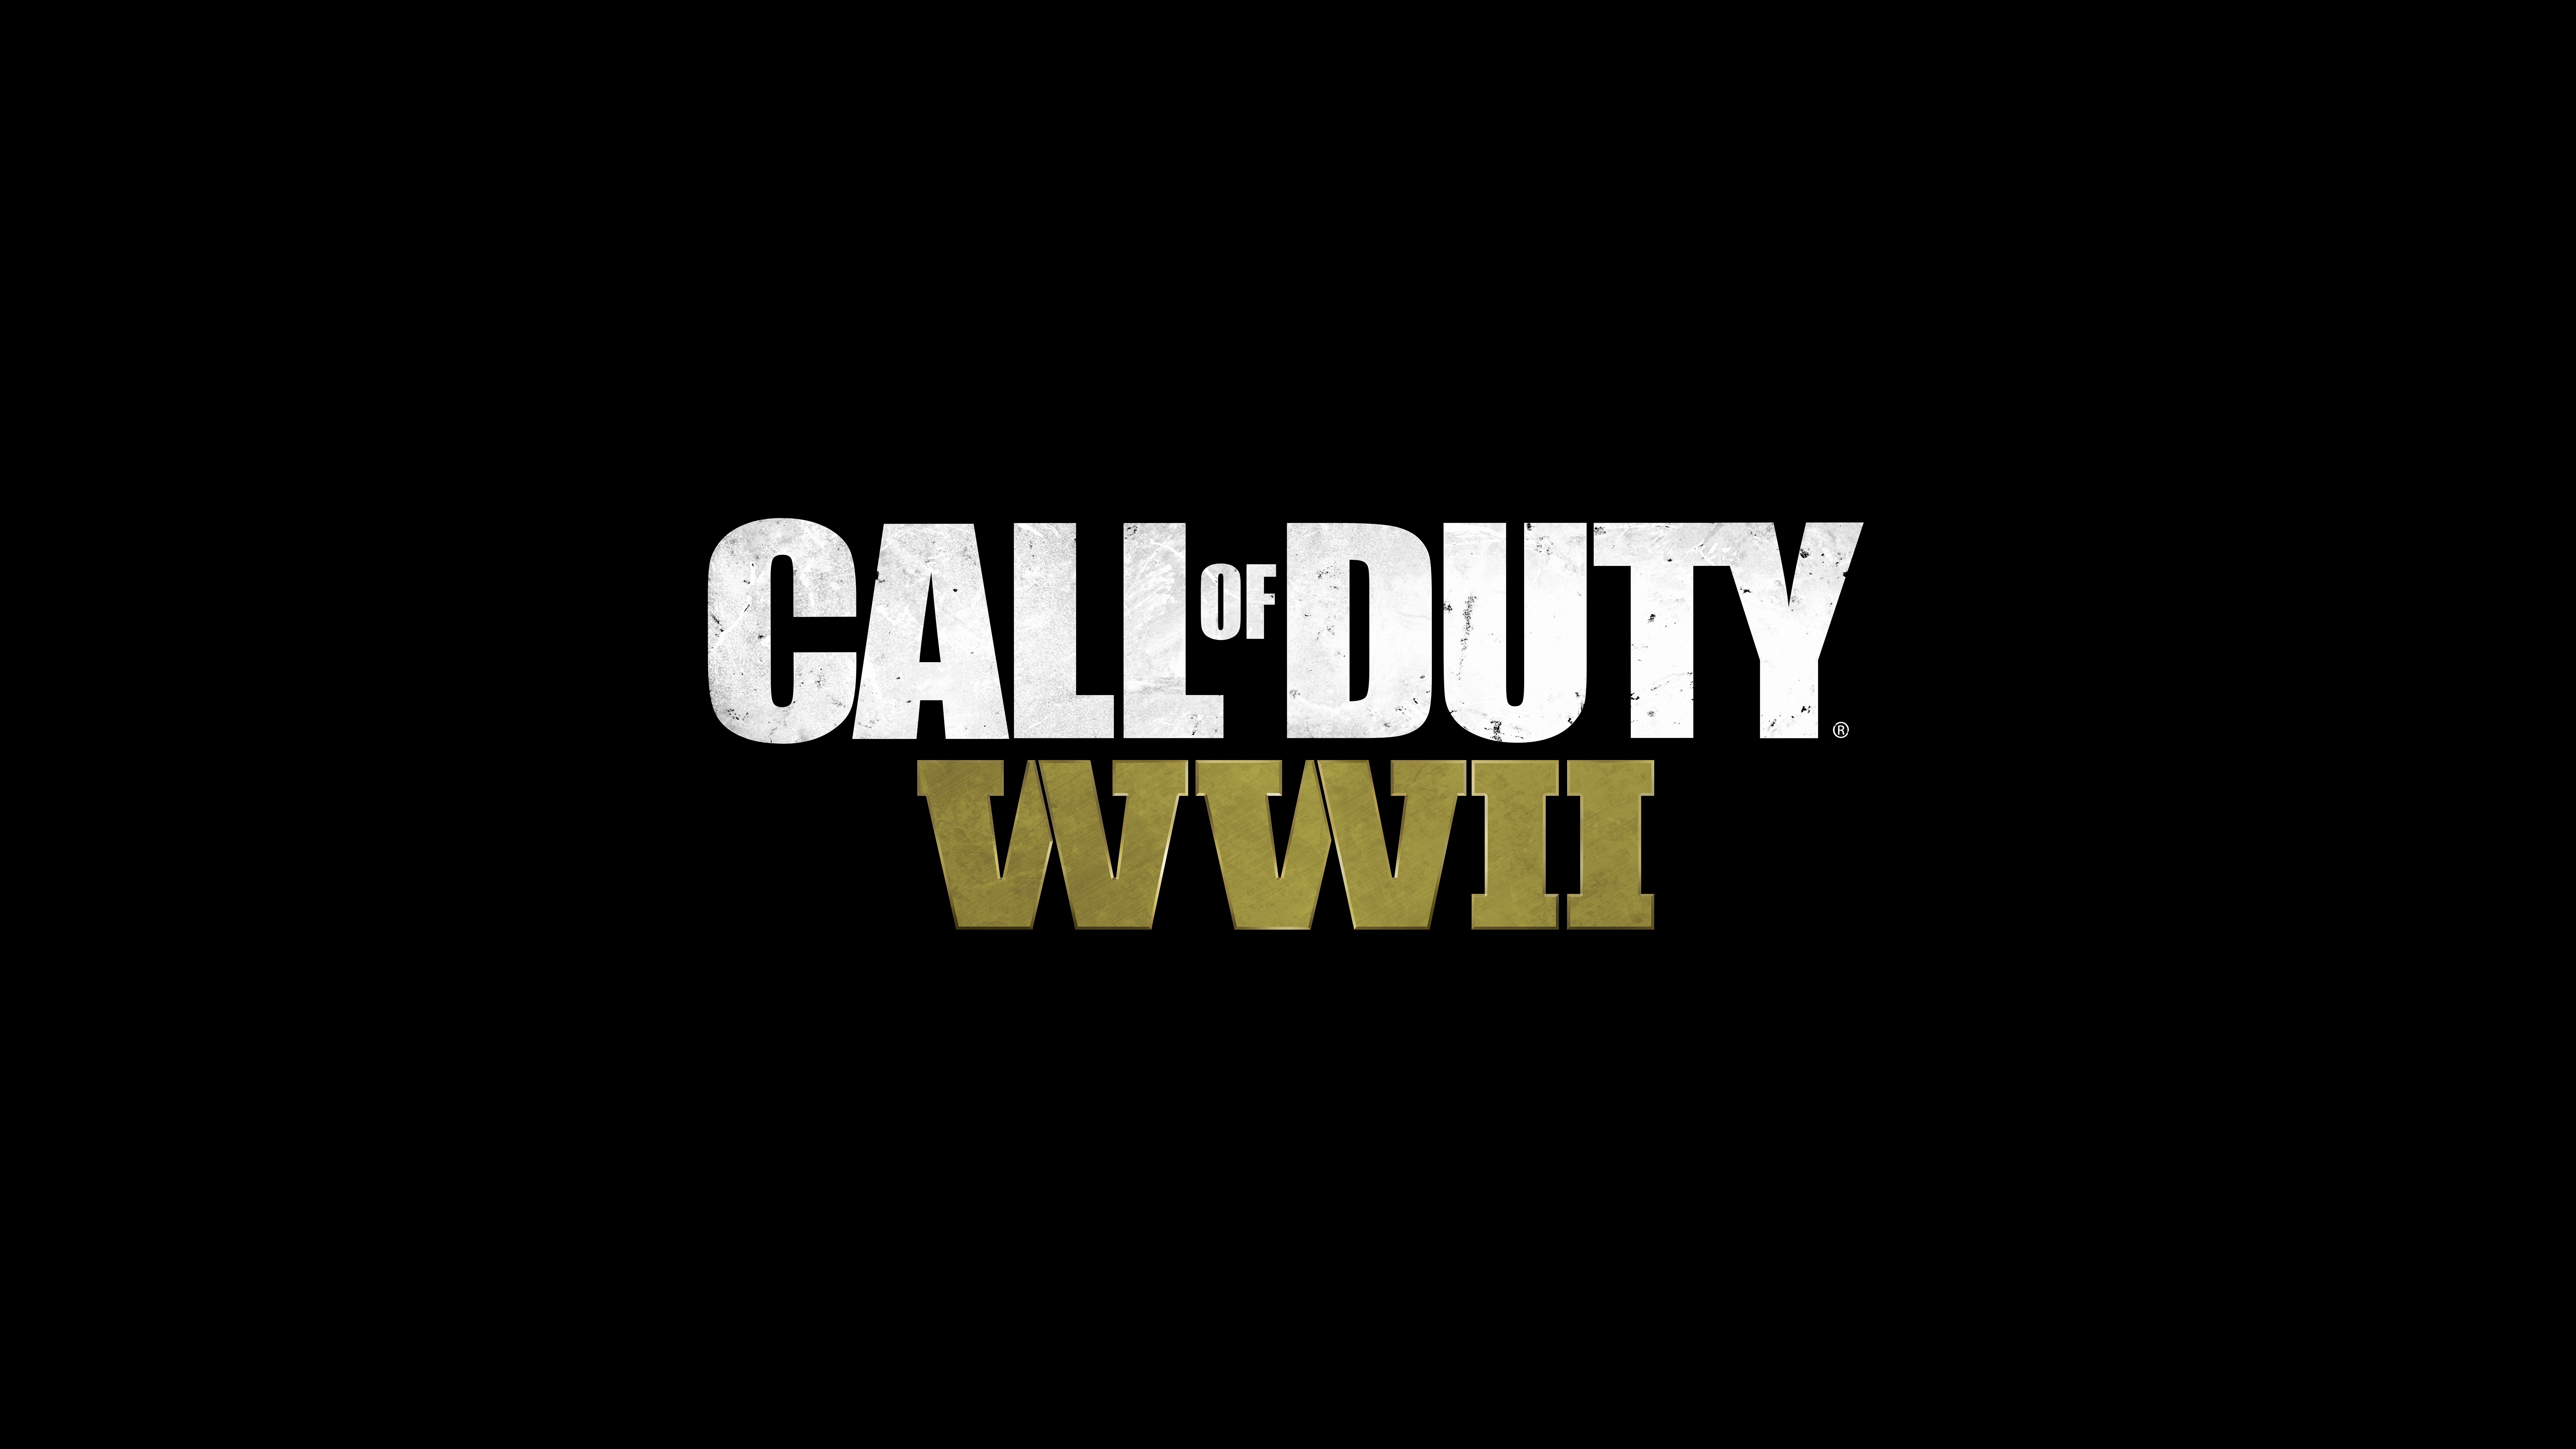 Call Of Duty Ww2 Wallpaper 4k: Call Of Duty WW2 Logo 8k, HD Games, 4k Wallpapers, Images